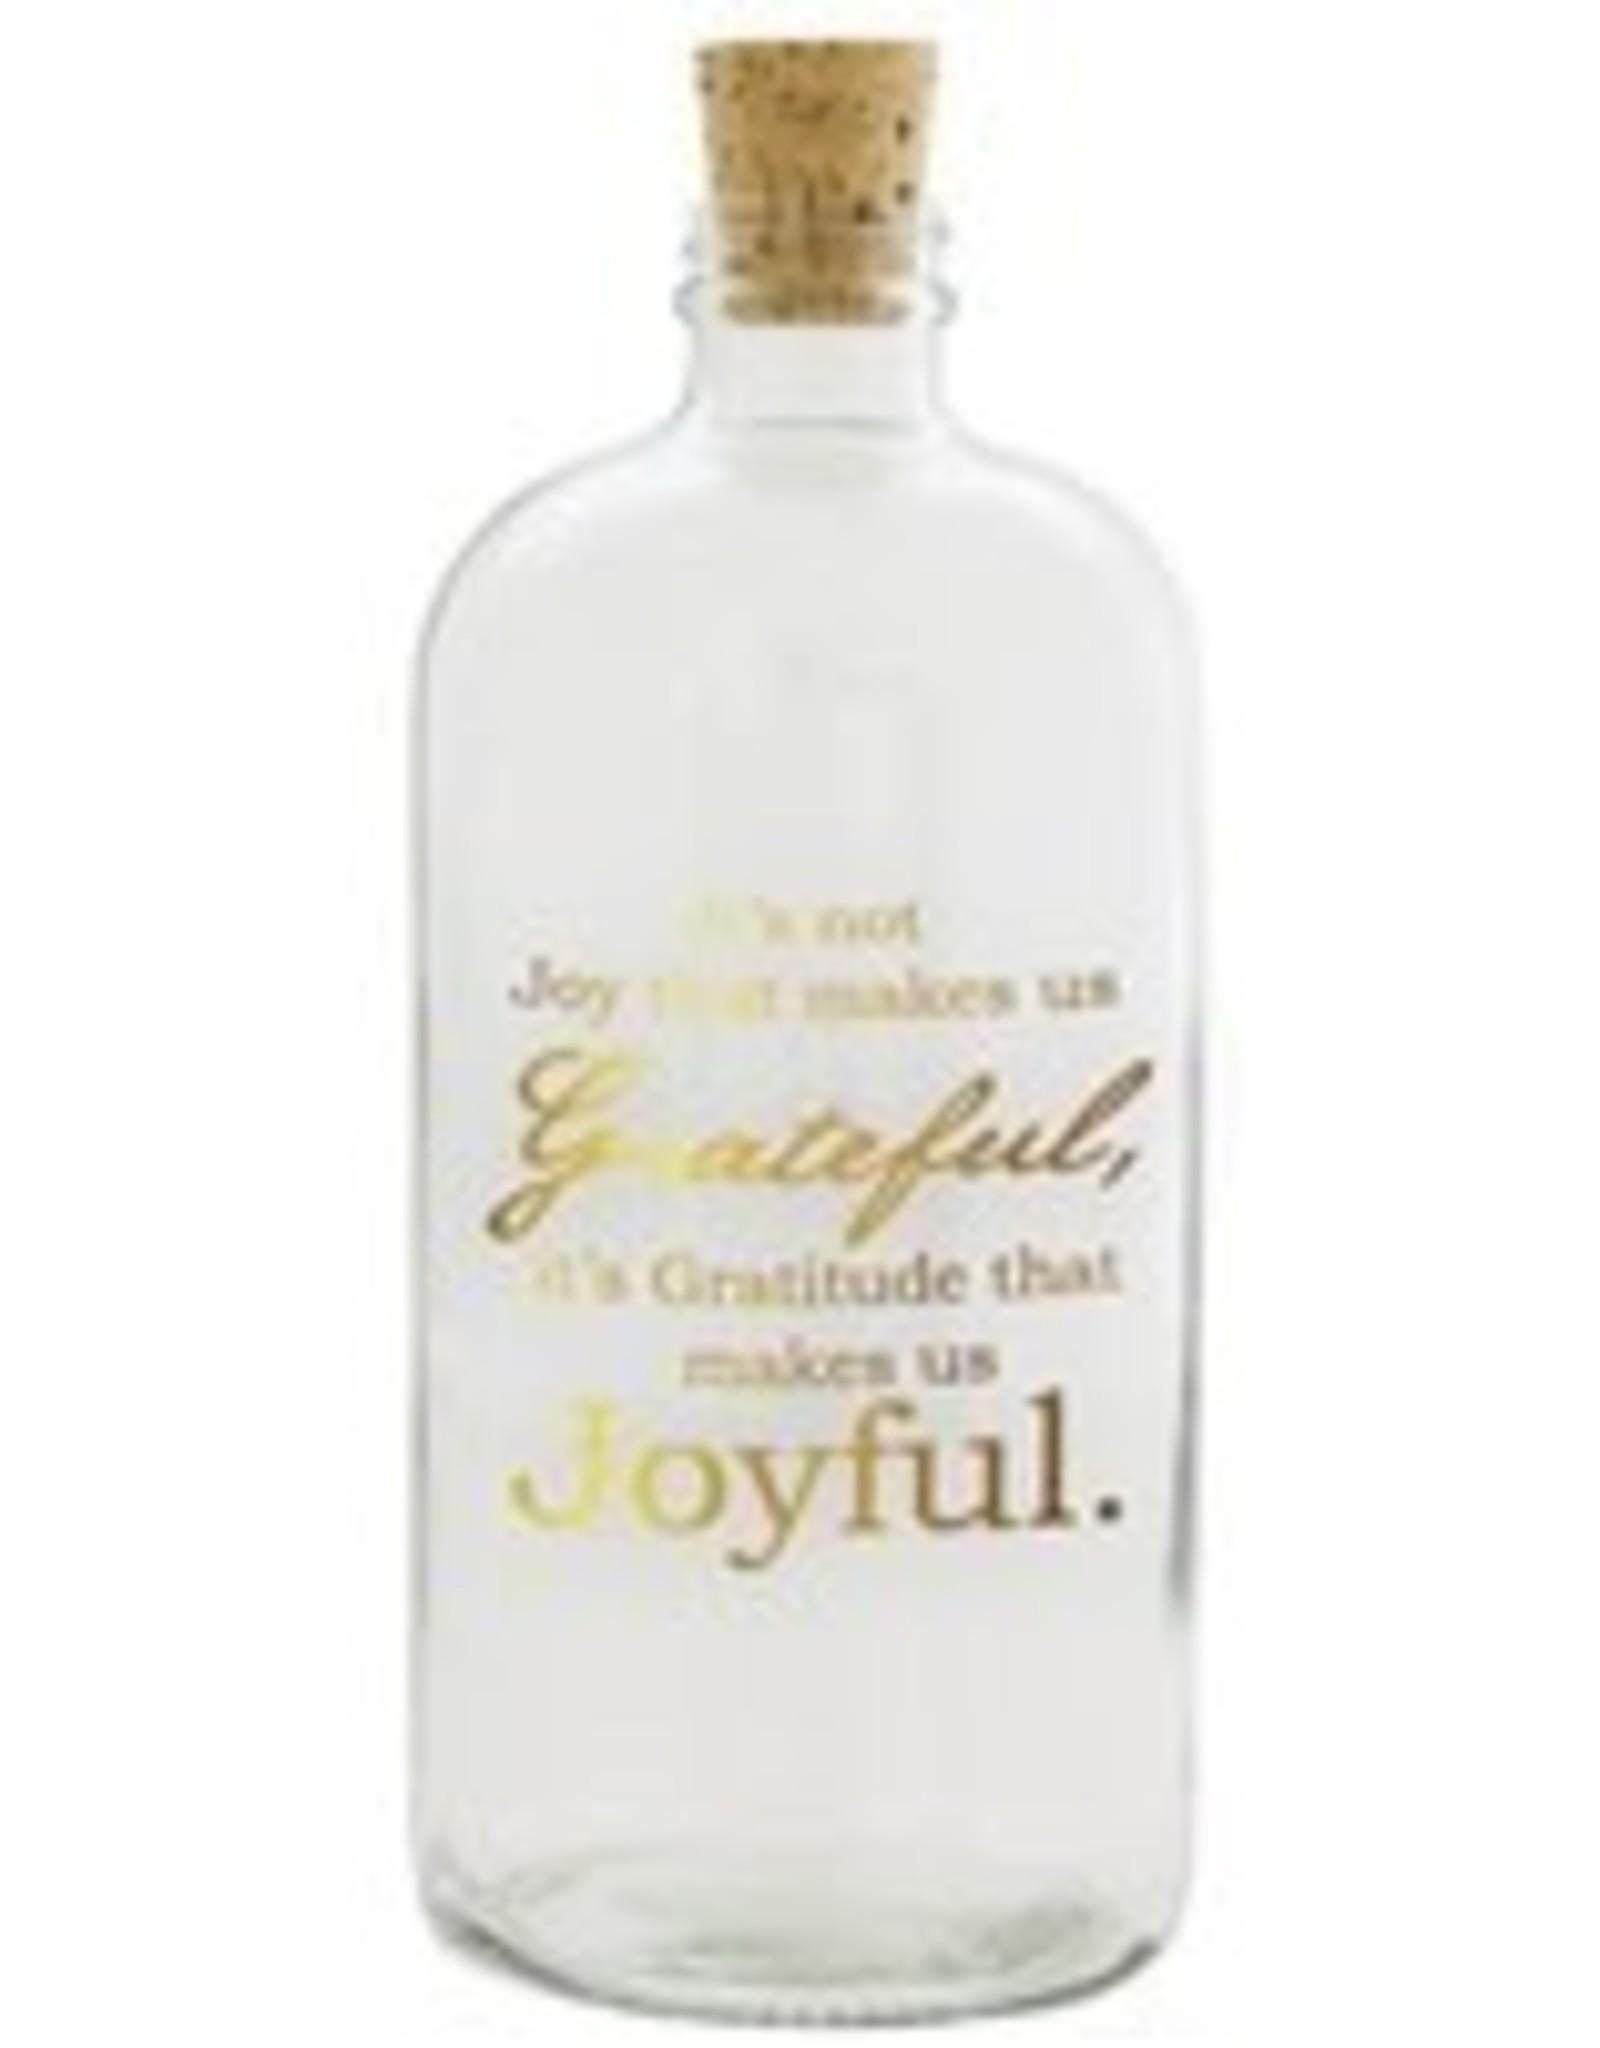 Penny Lane-Joyful Jar (Clear with Gold)